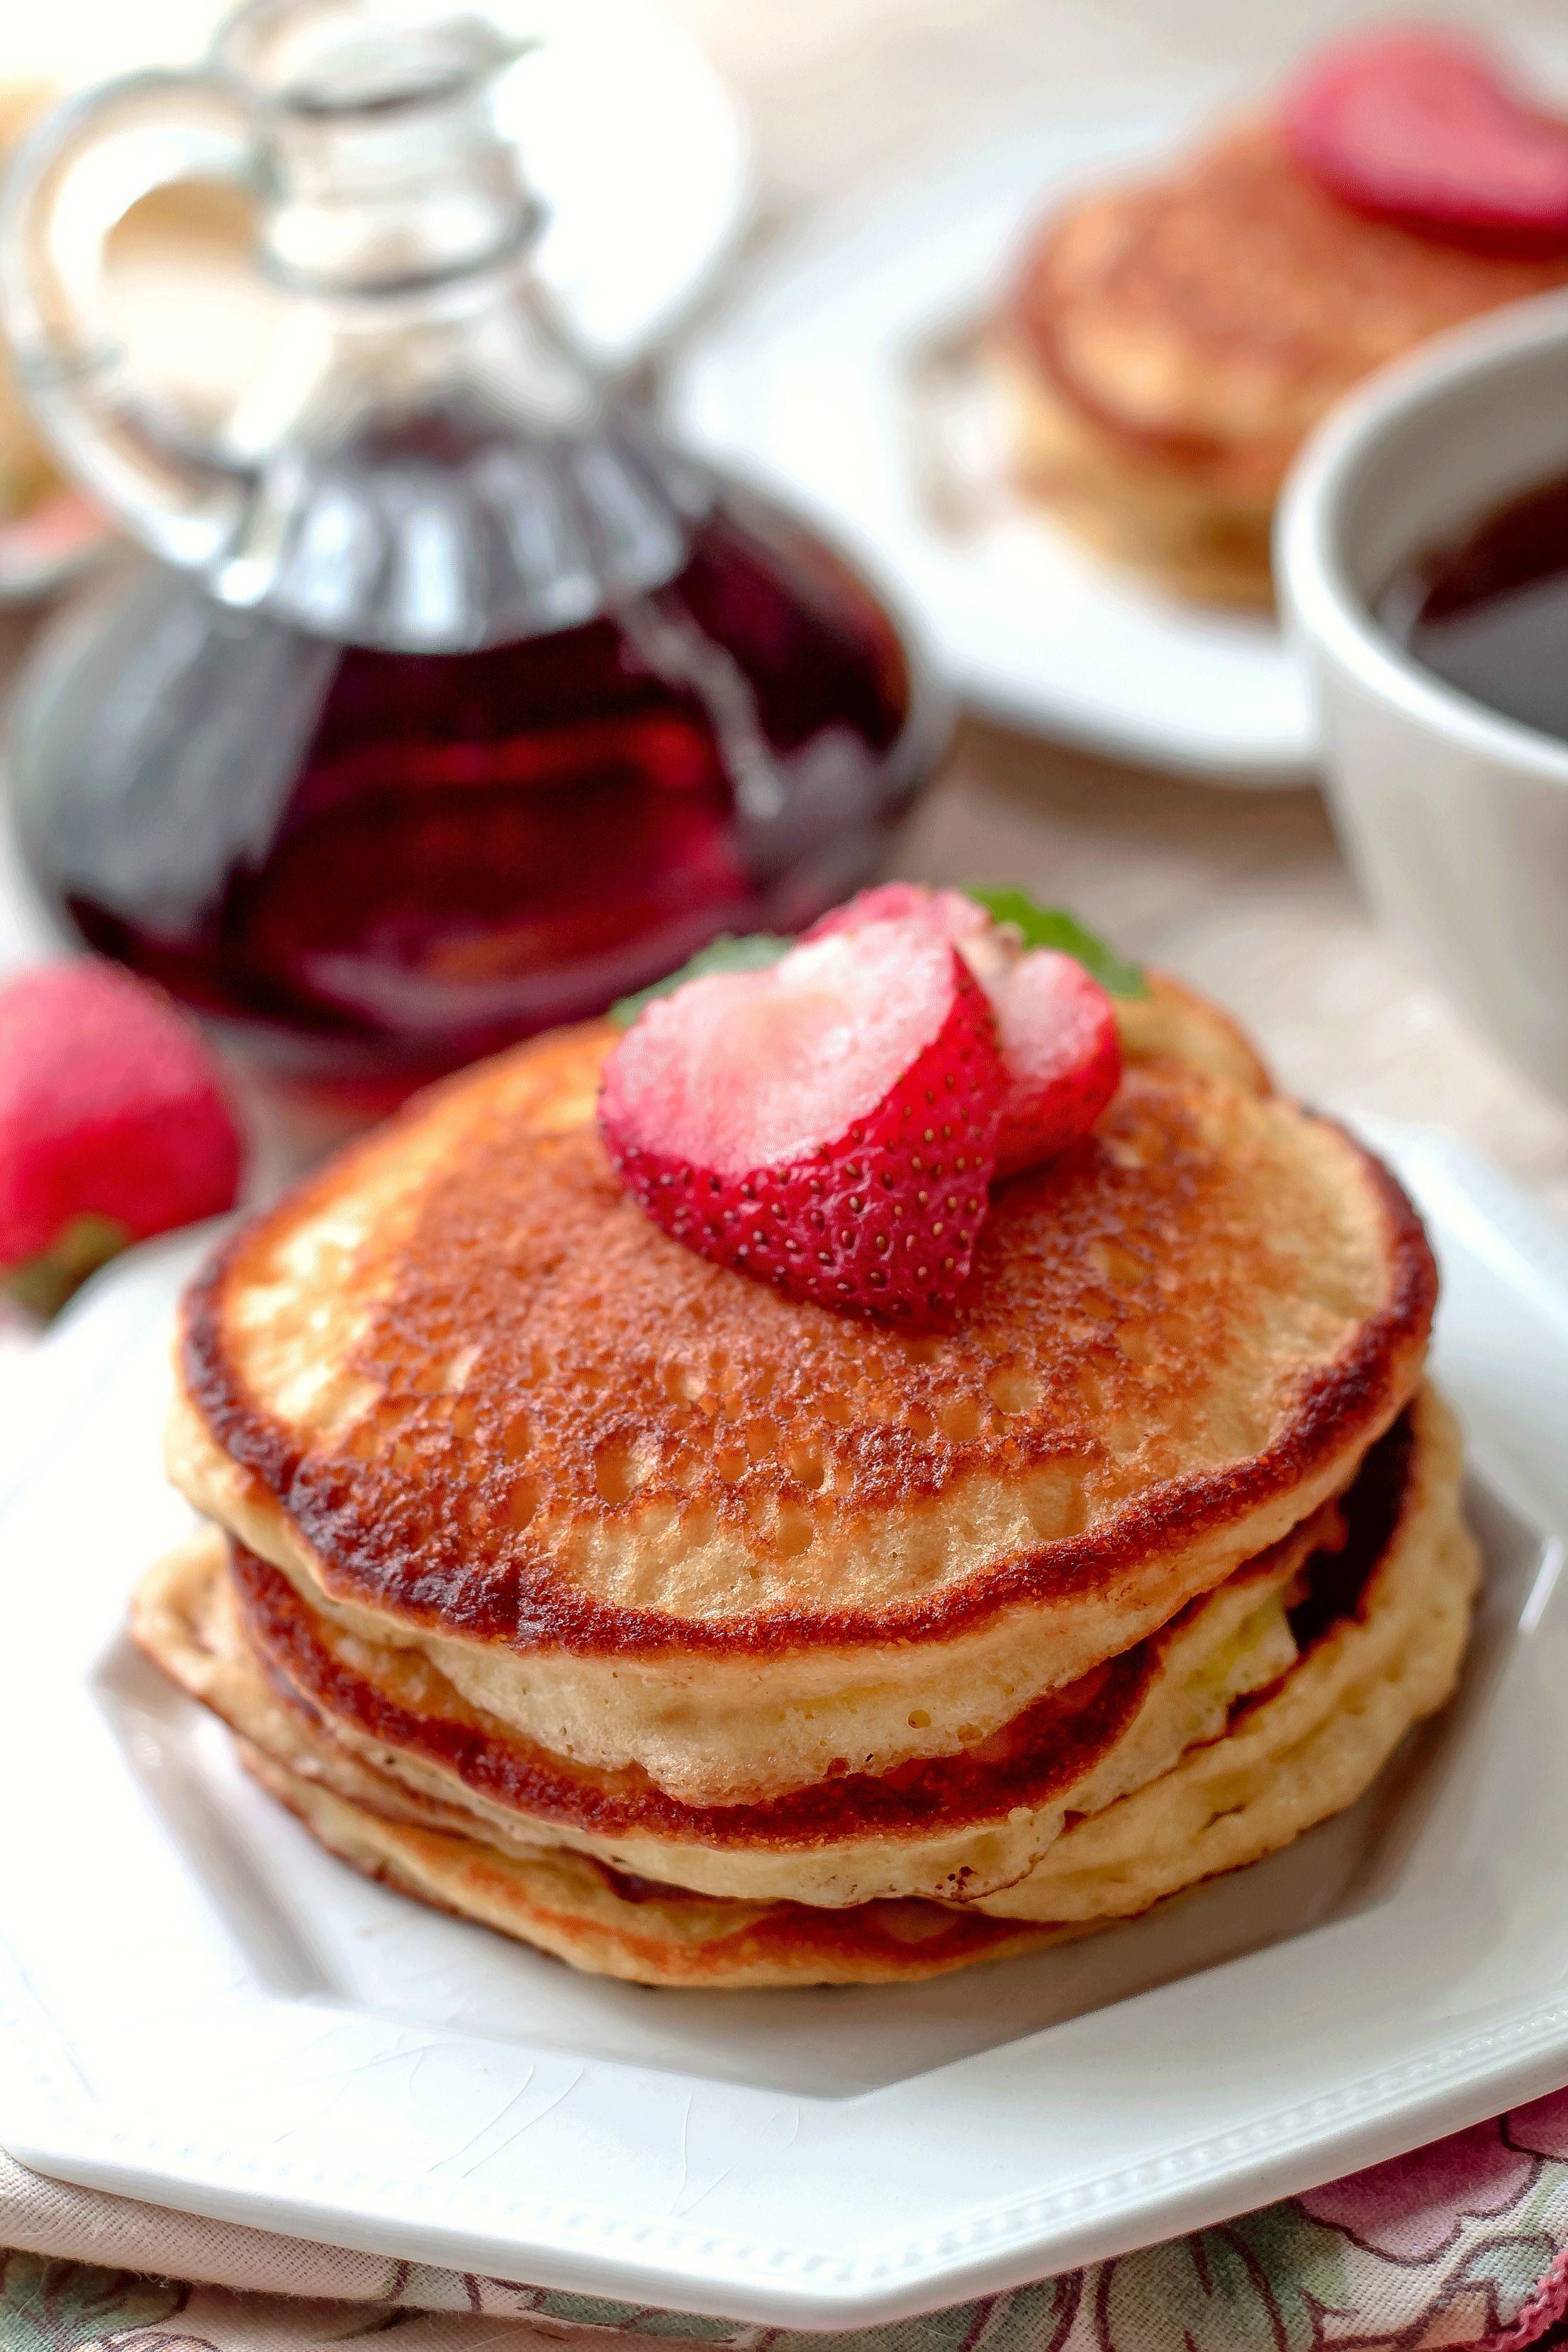 Sour Cream Pancakes Pioneer Woman Recipe In 2020 Breakfast Brunch Recipes Sour Cream Recipes Sour Cream Pancakes